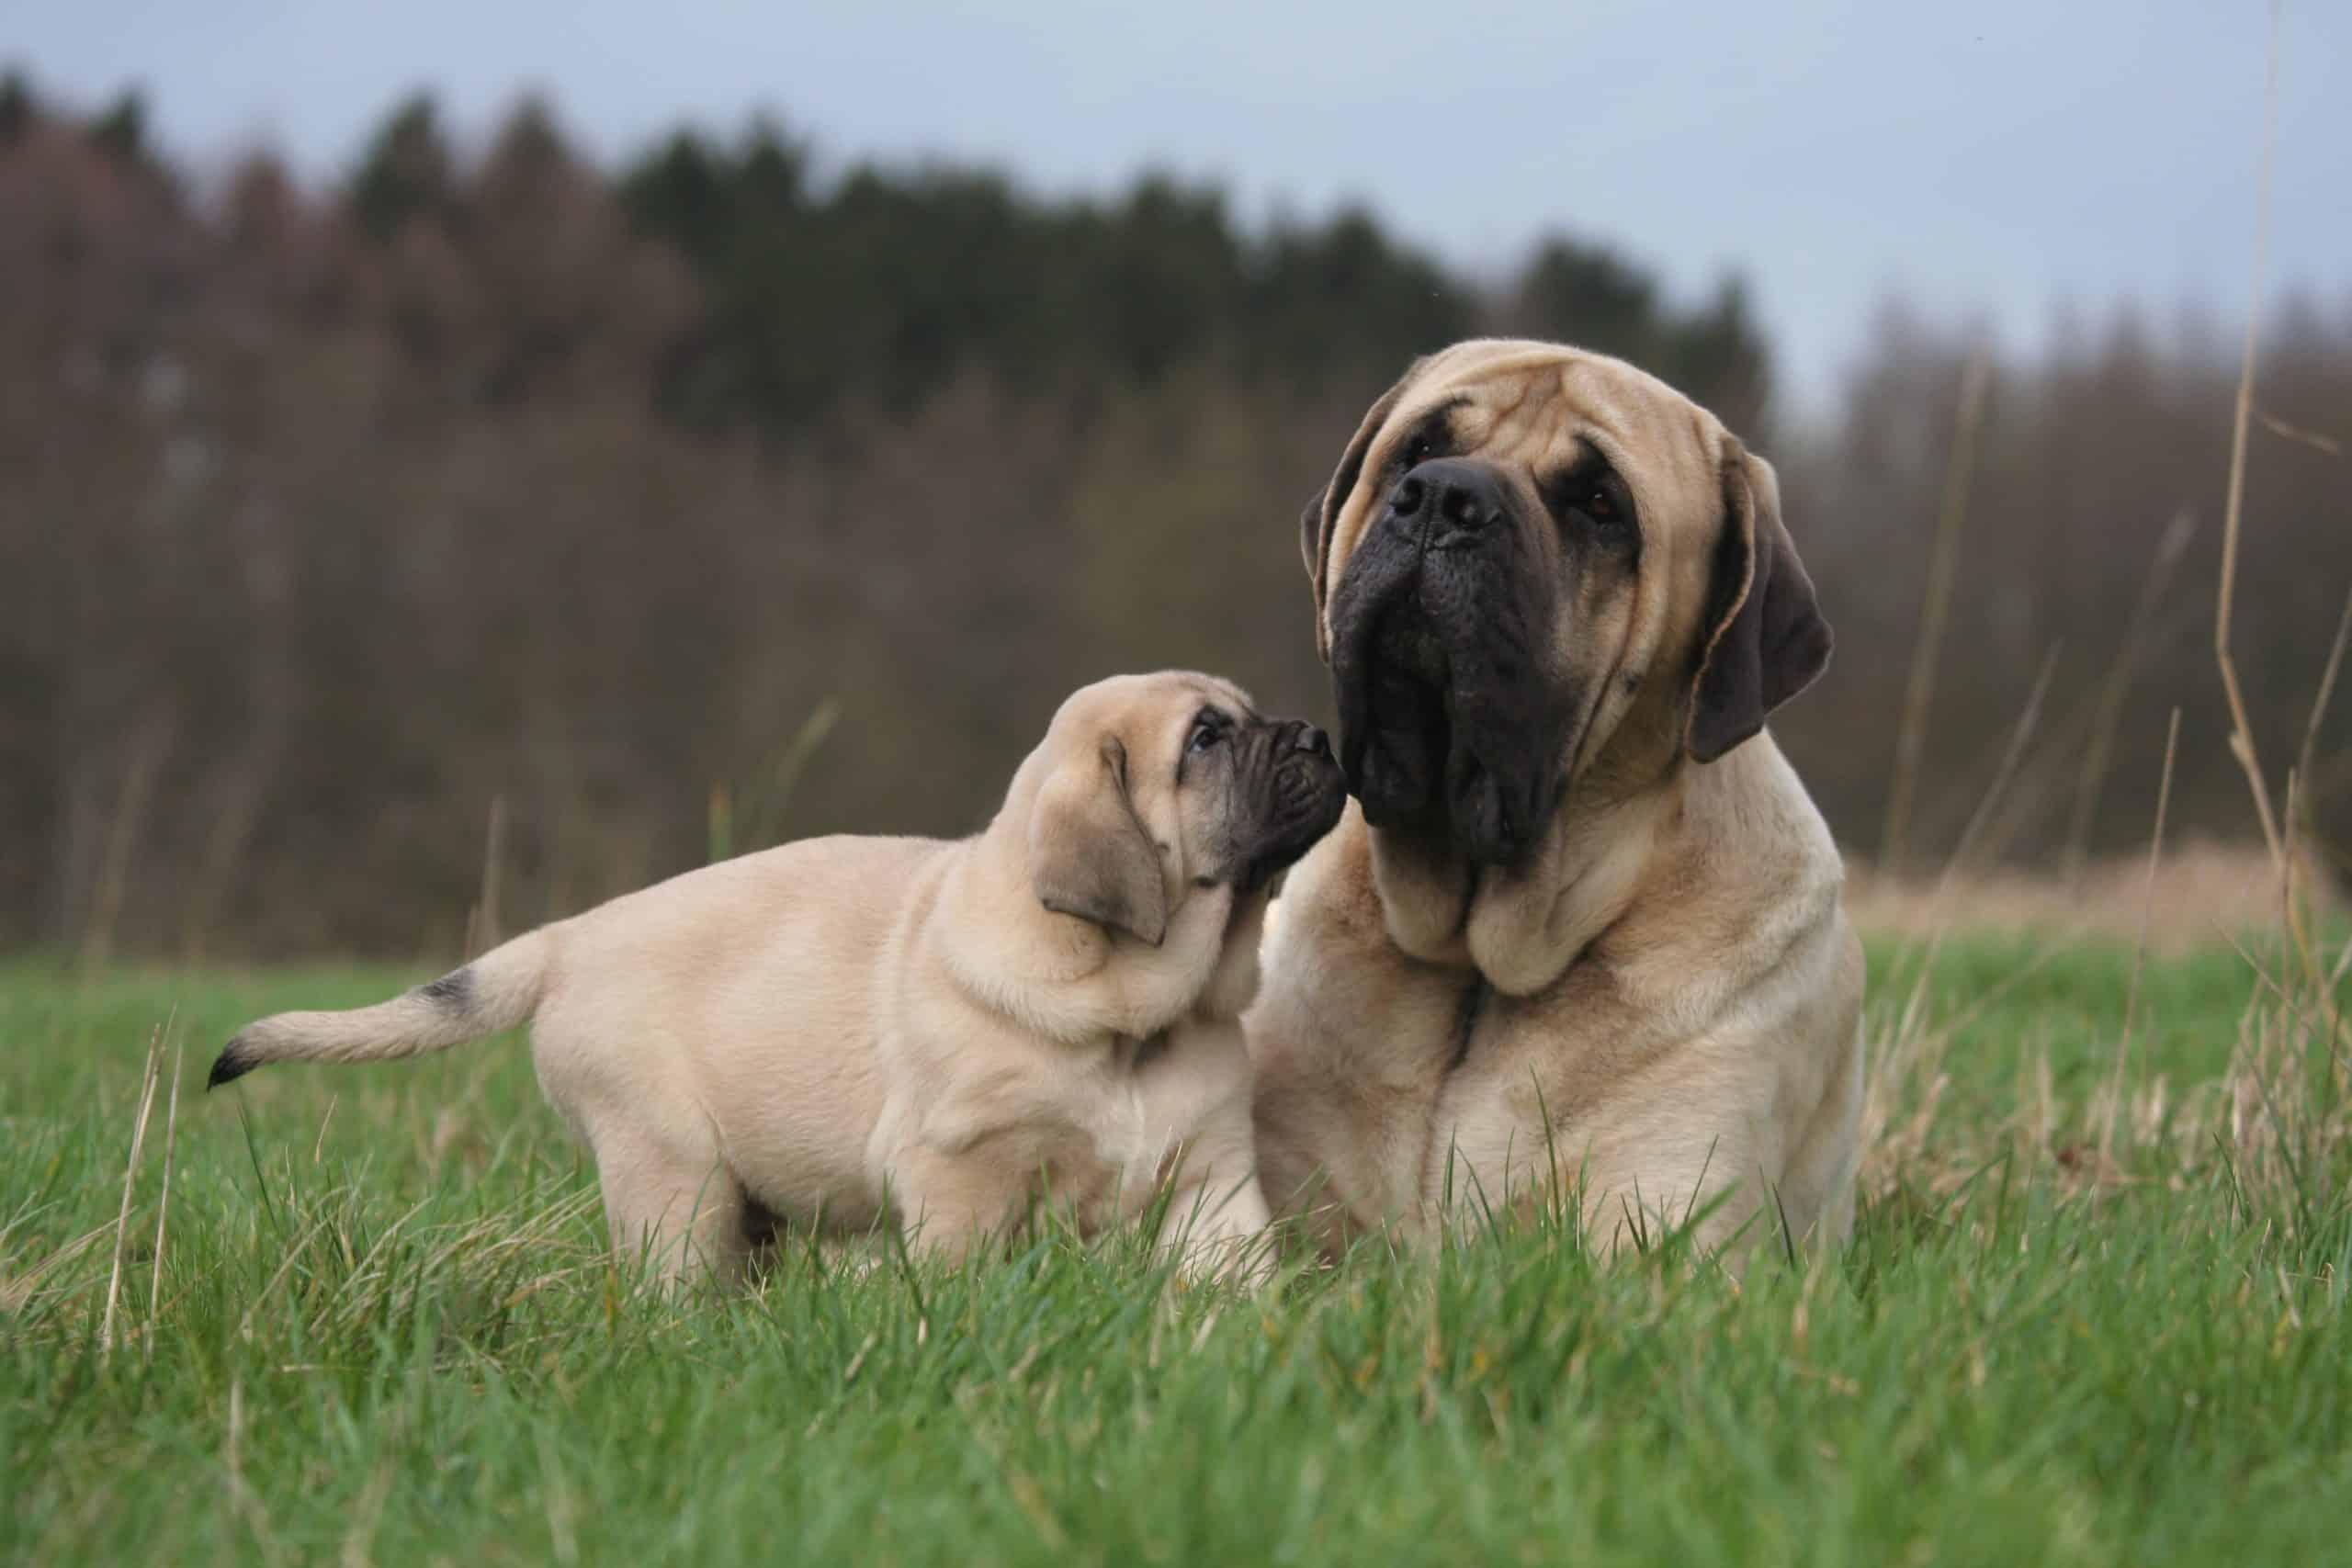 mastiff puppy with larger dog